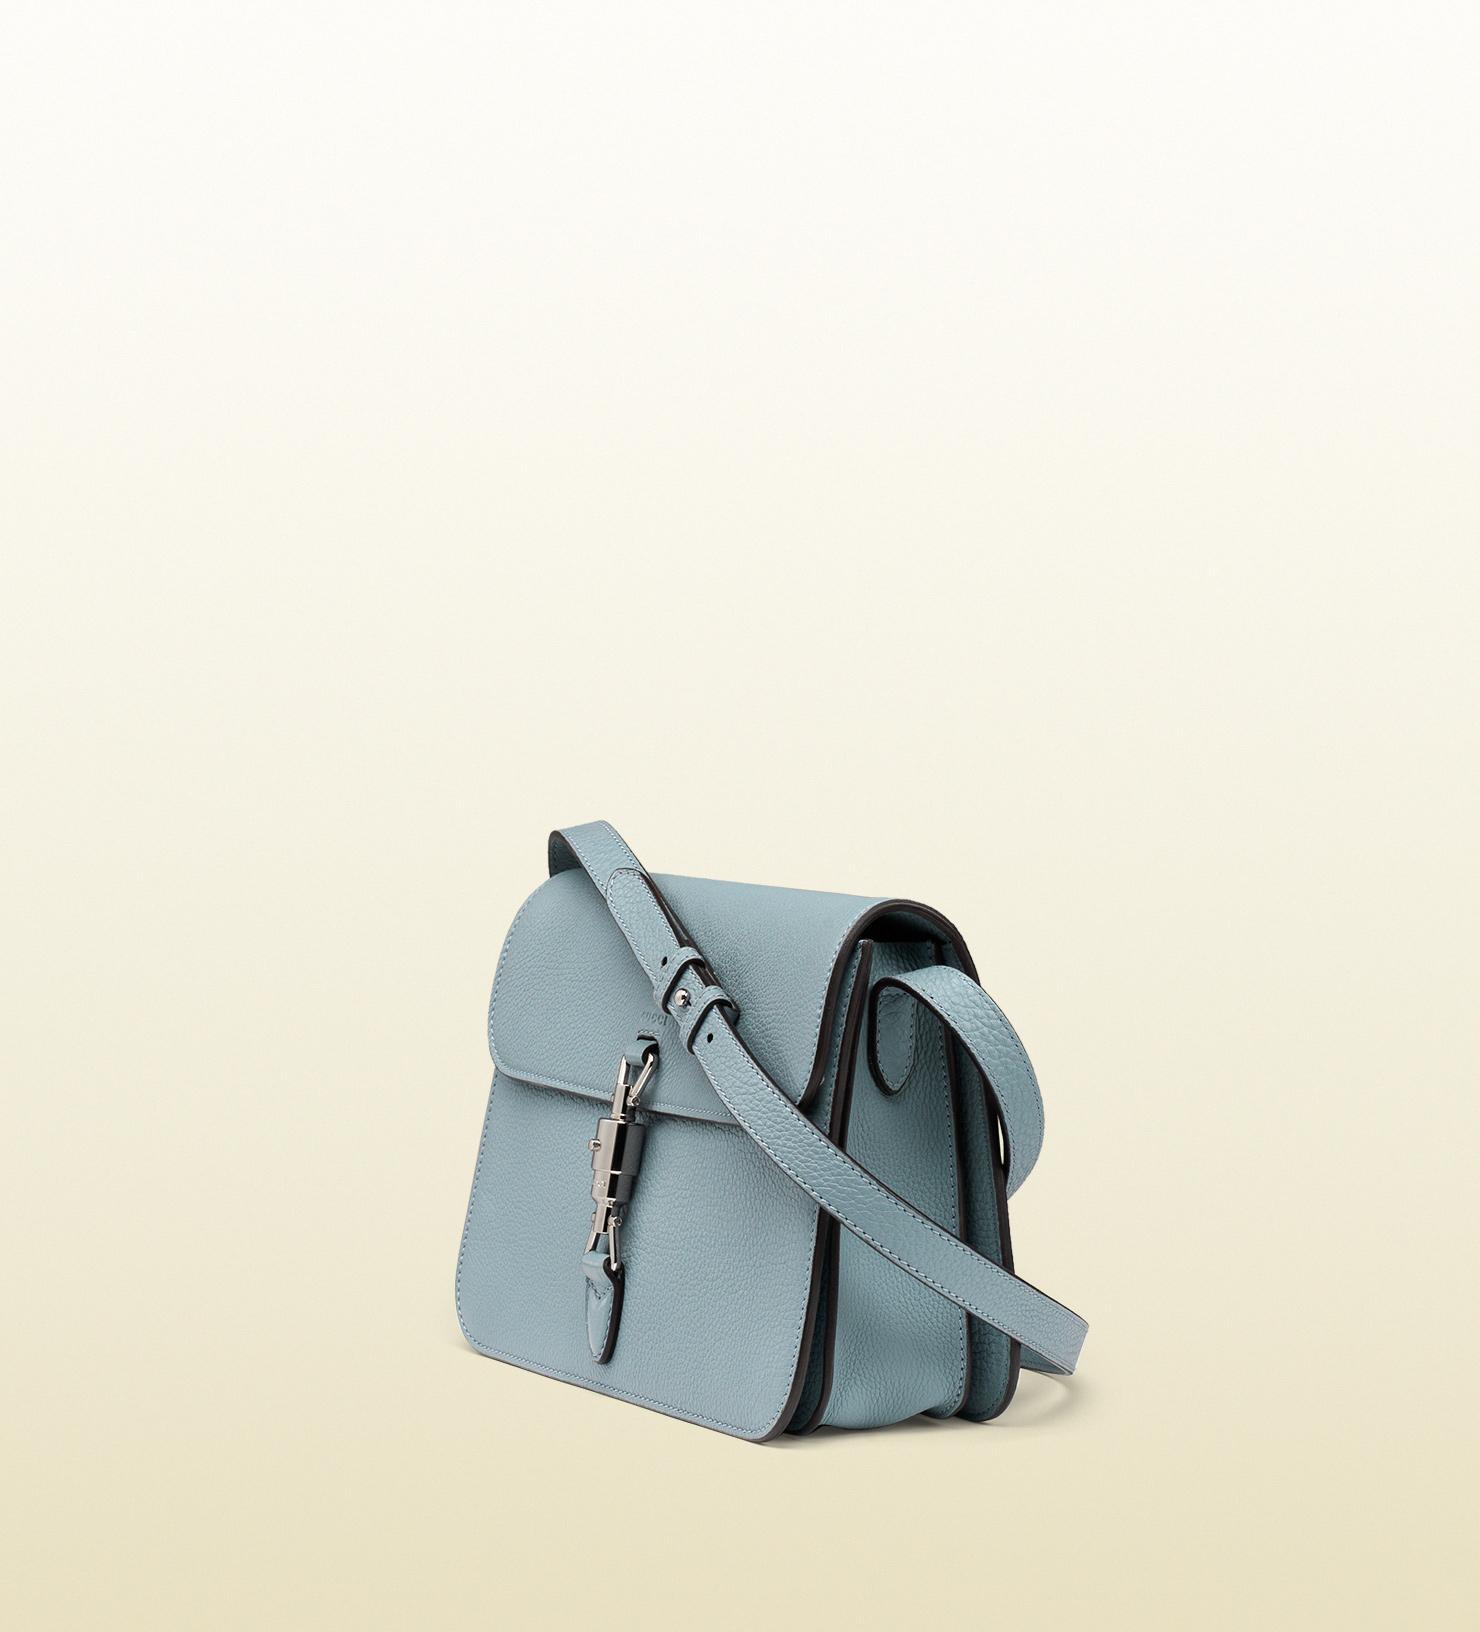 53b573191f Lyst - Gucci Jackie Soft Leather Flap Shoulder Bag in Blue